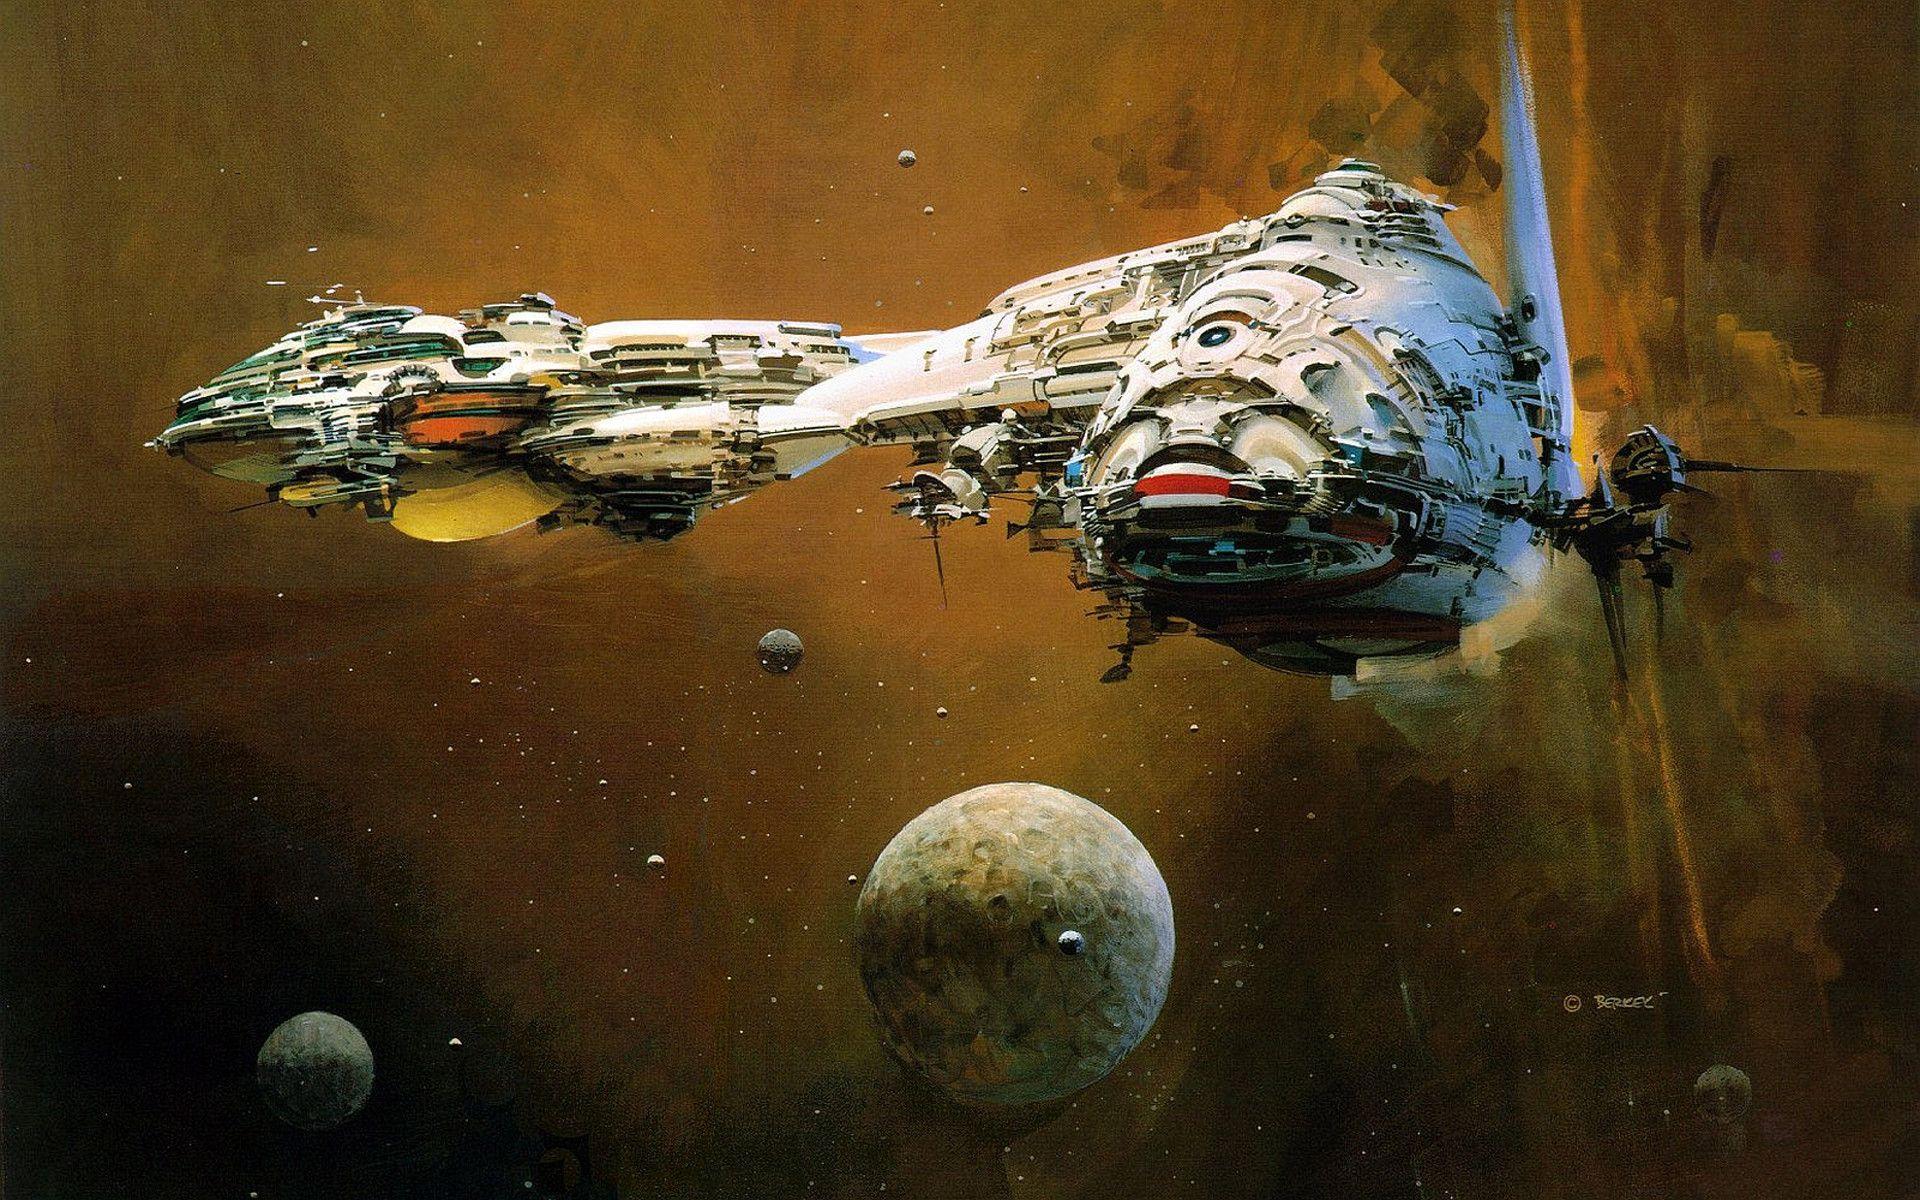 Sci Fi Wallpaper Science Fiction Artwork Space Art Sf Art